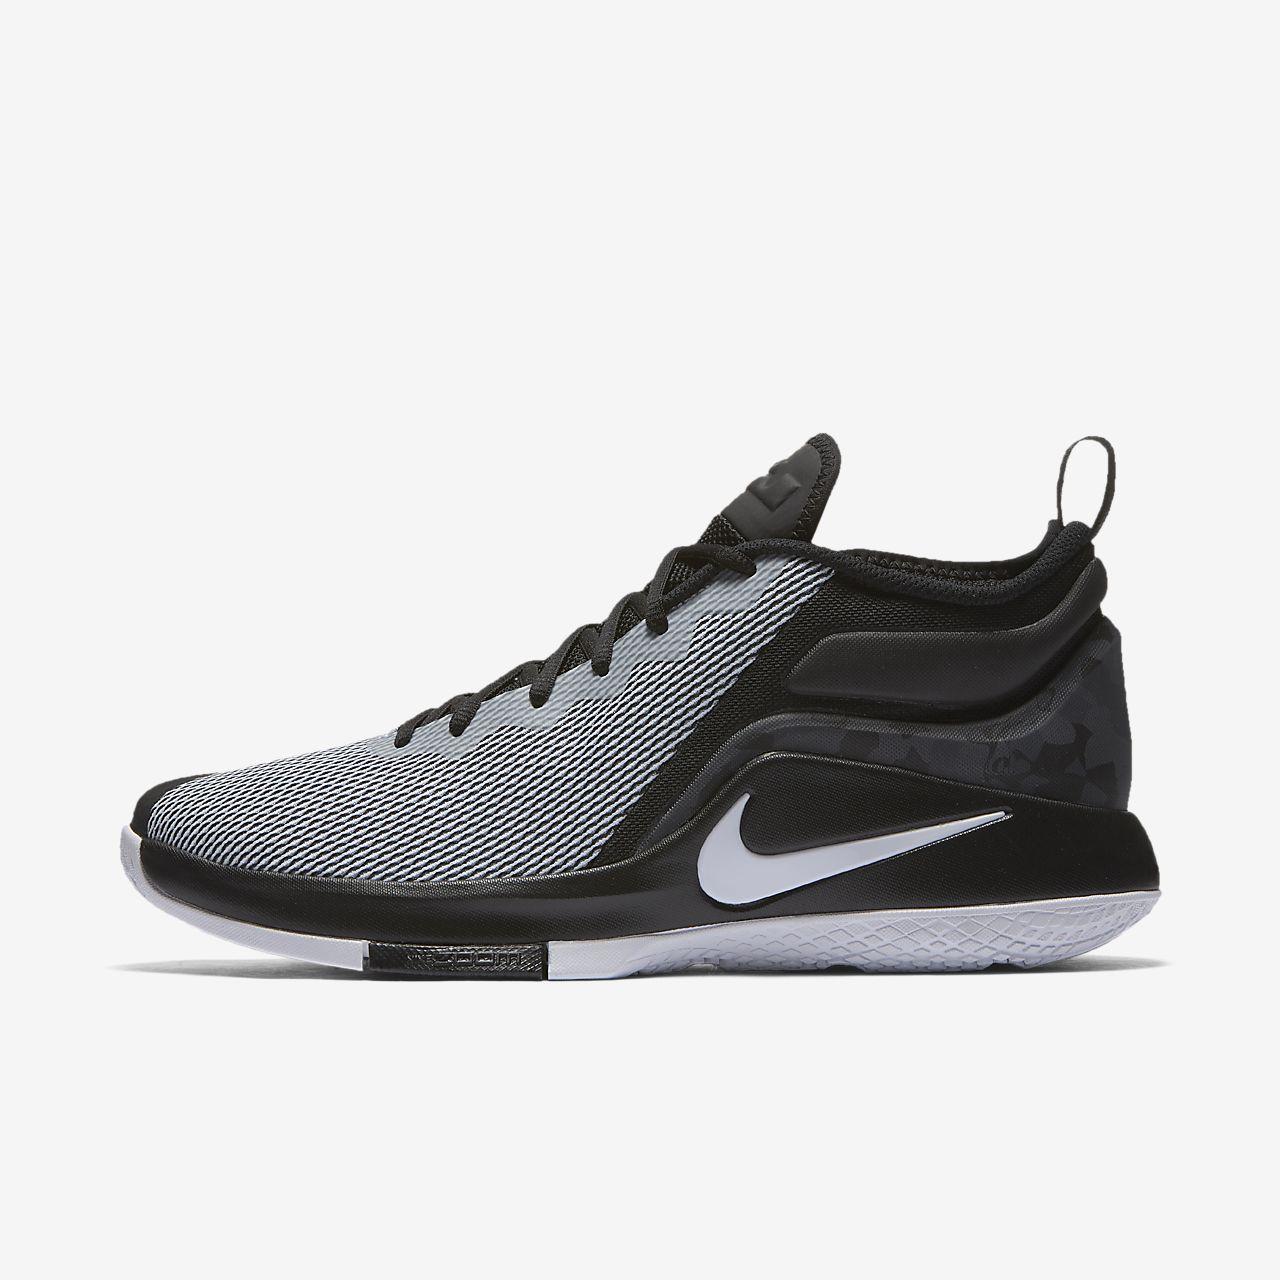 Weiß Schuhe Rot Nike Lebron Witness Herren Basketball